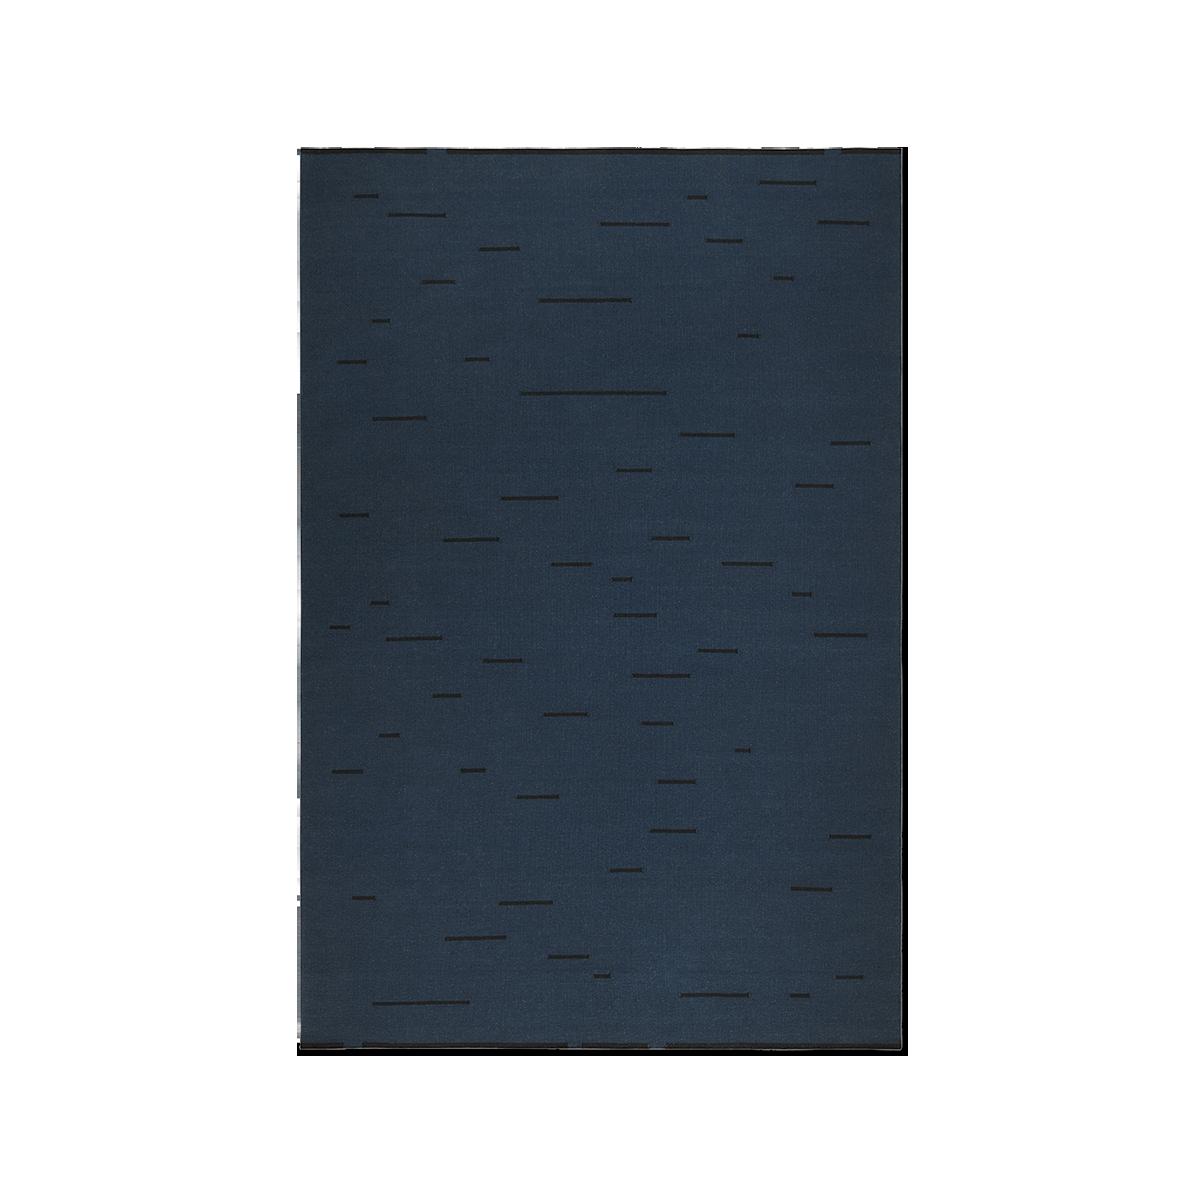 Product image of Rain Teal flat-weave rug.